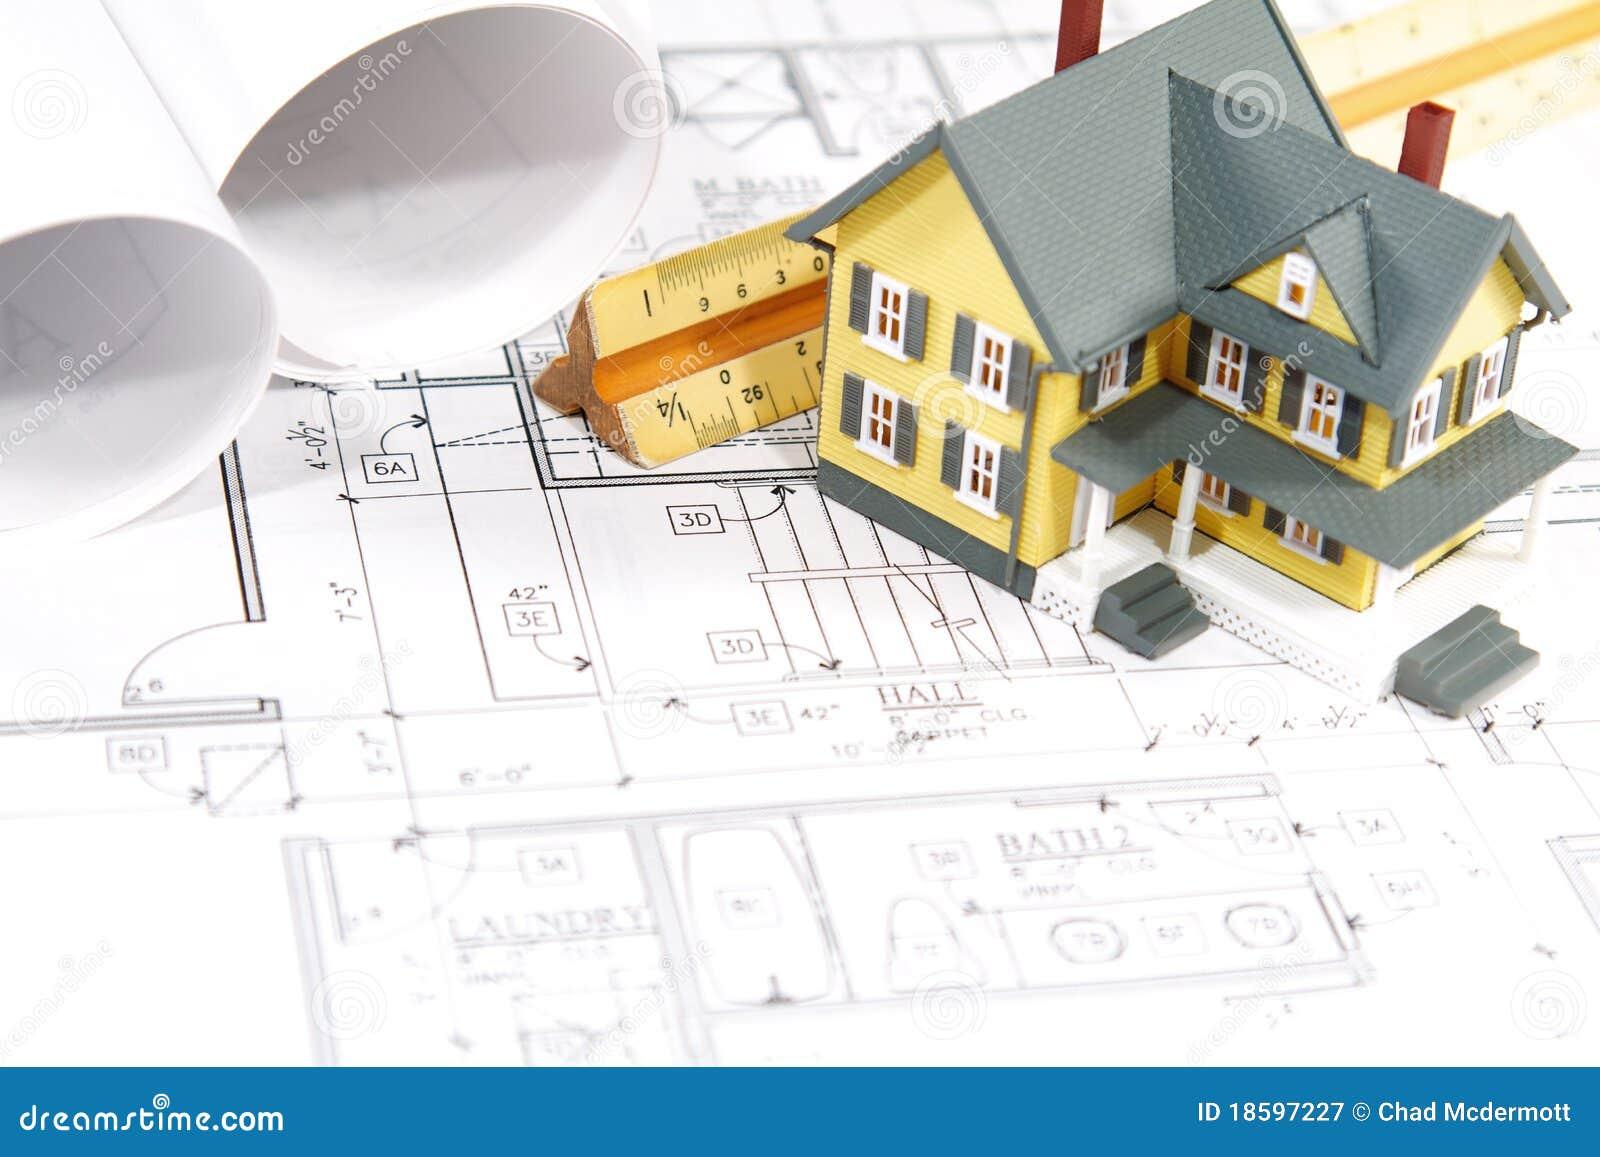 tiny house plans home architectural plans 13. home blueprints 78 ... - ^